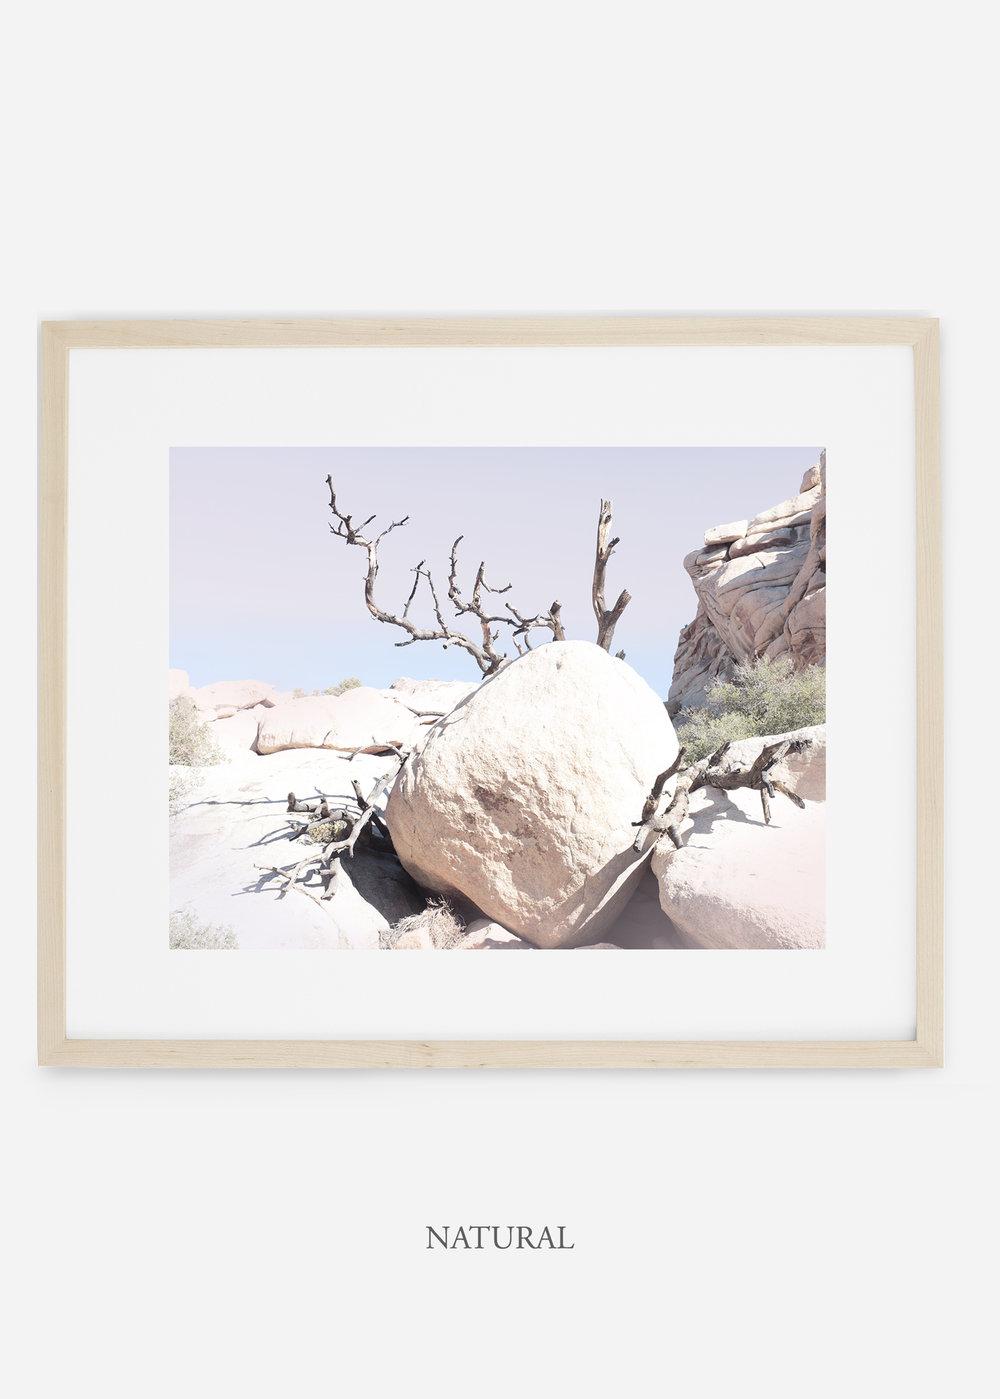 WilderCalifornia_natural_JoshuaTree_No.17_interiordesign_prints_art.jpg